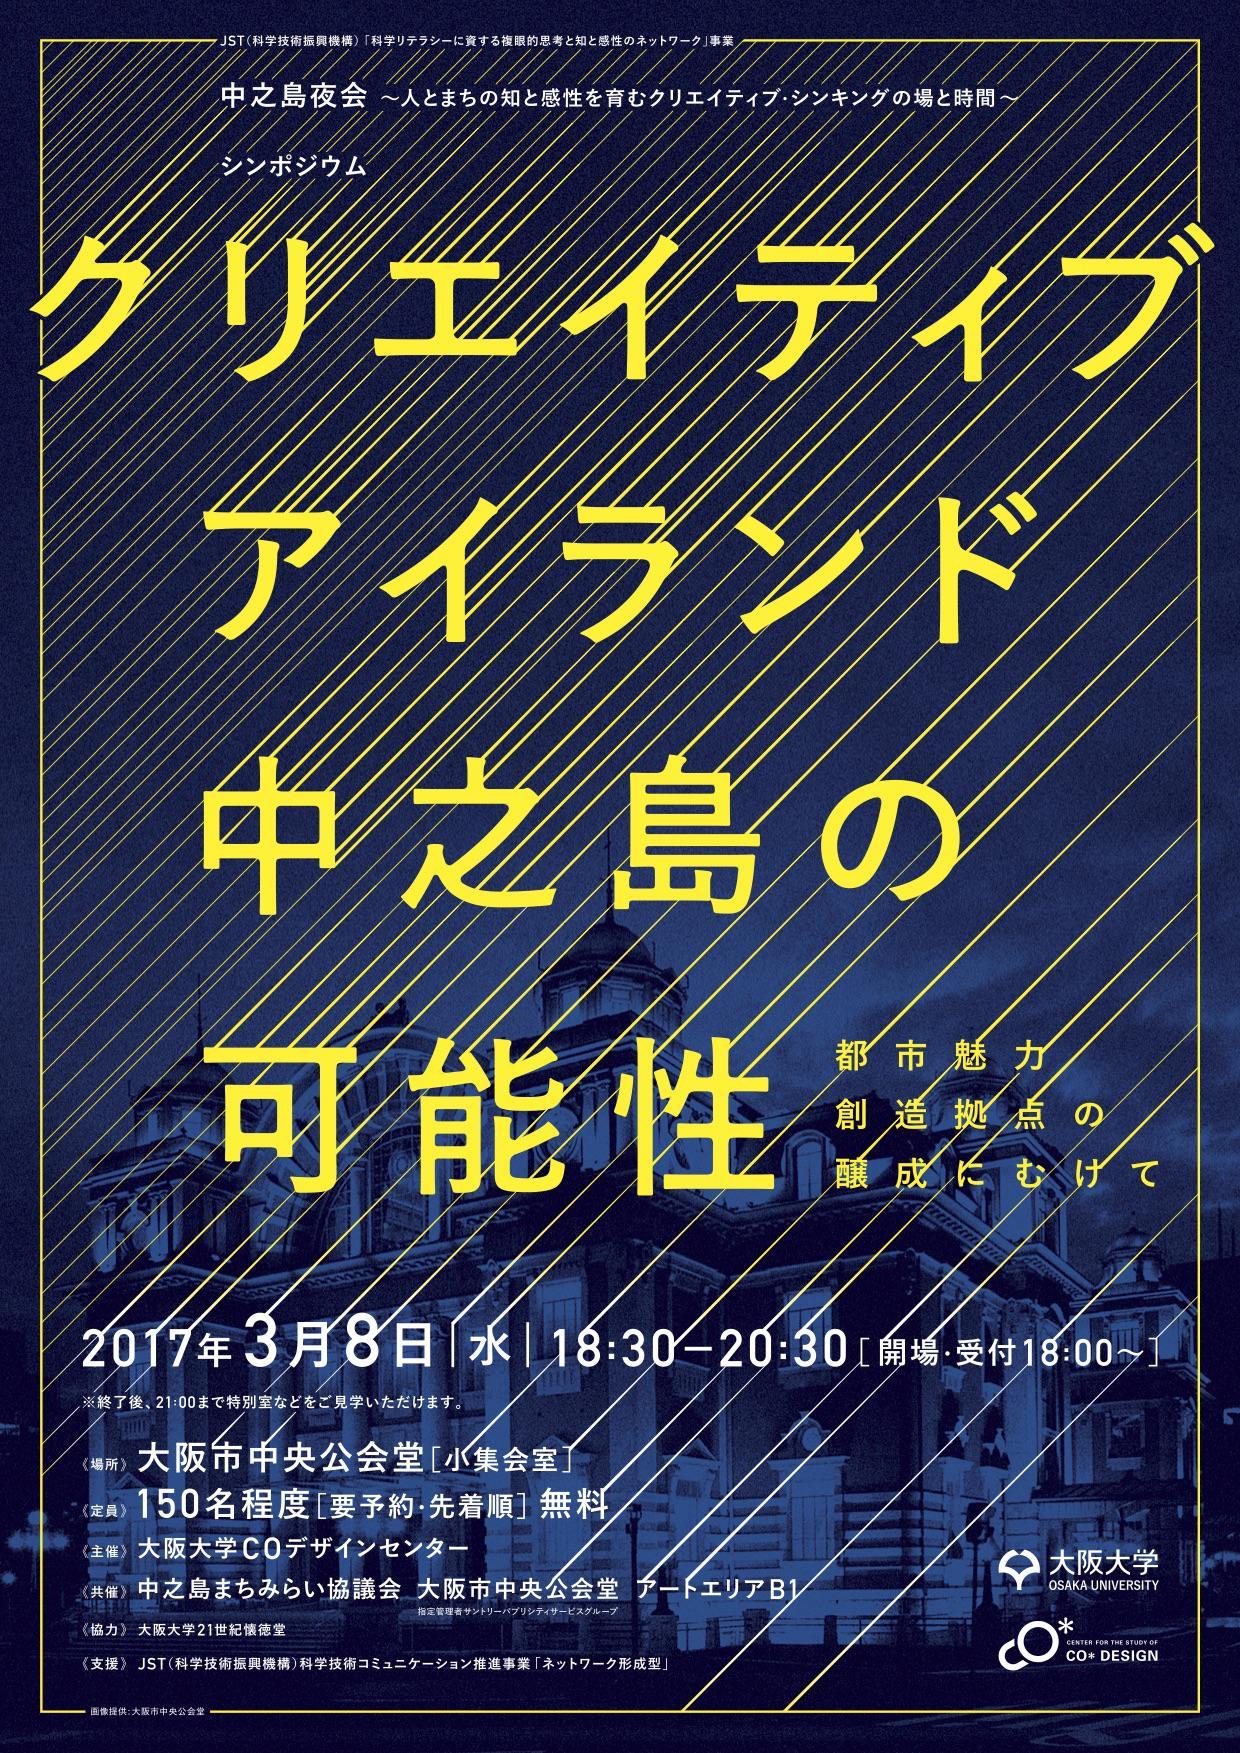 0207_nakanoshima-symposium 2.jpg